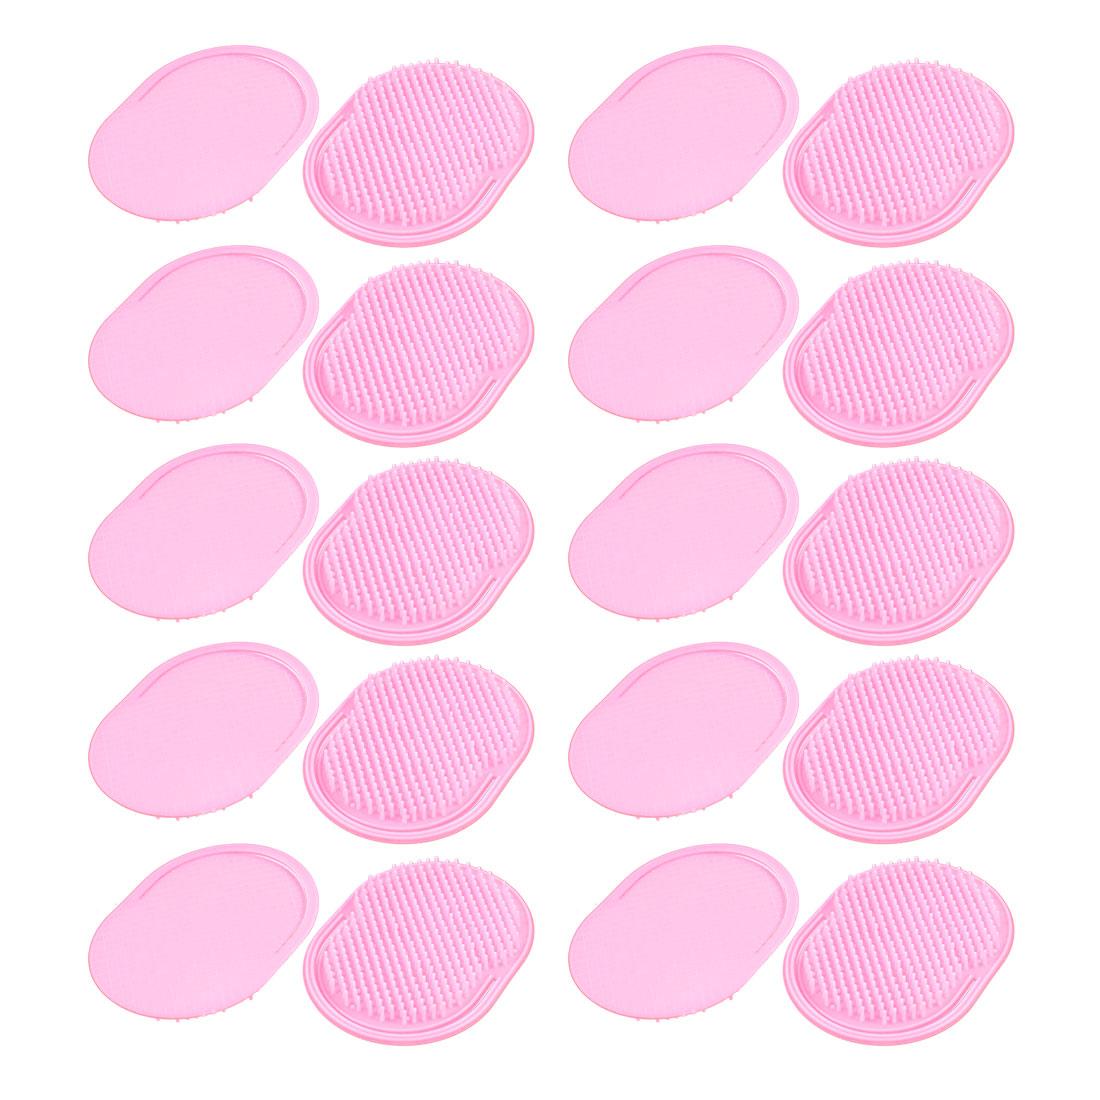 Oval Shaped Palm Hair Comb Scalp Massage Brush Pink 20Pcs